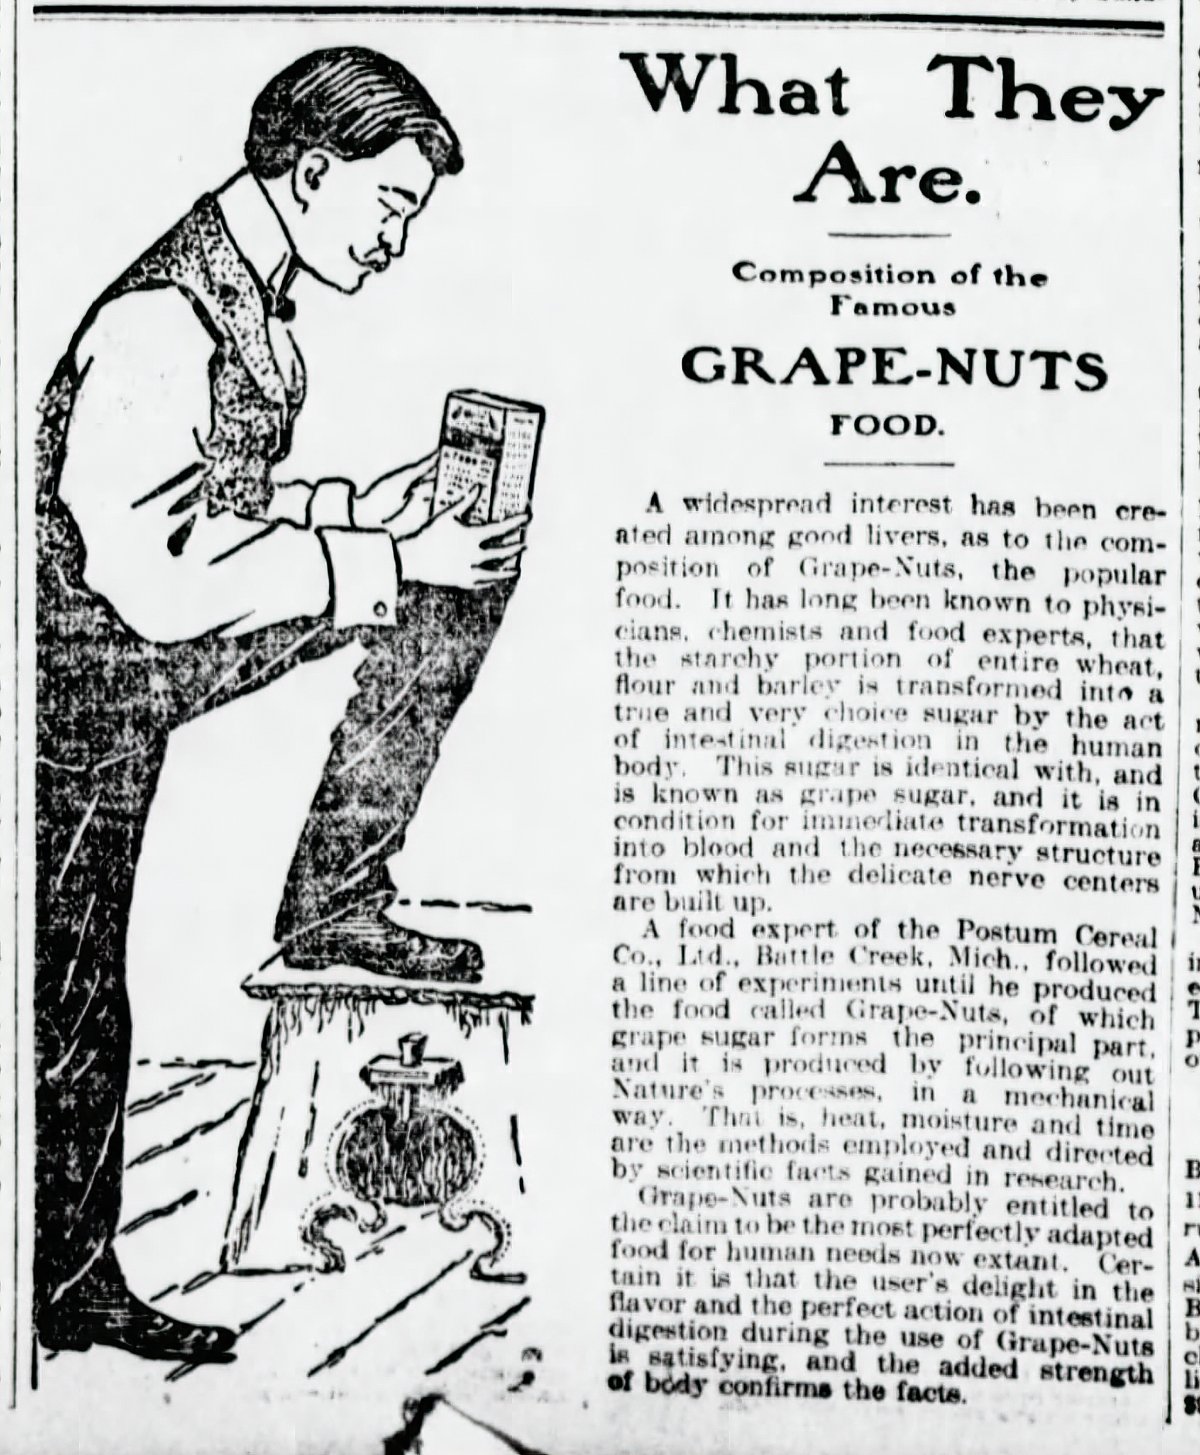 Grape Nuts aidsD